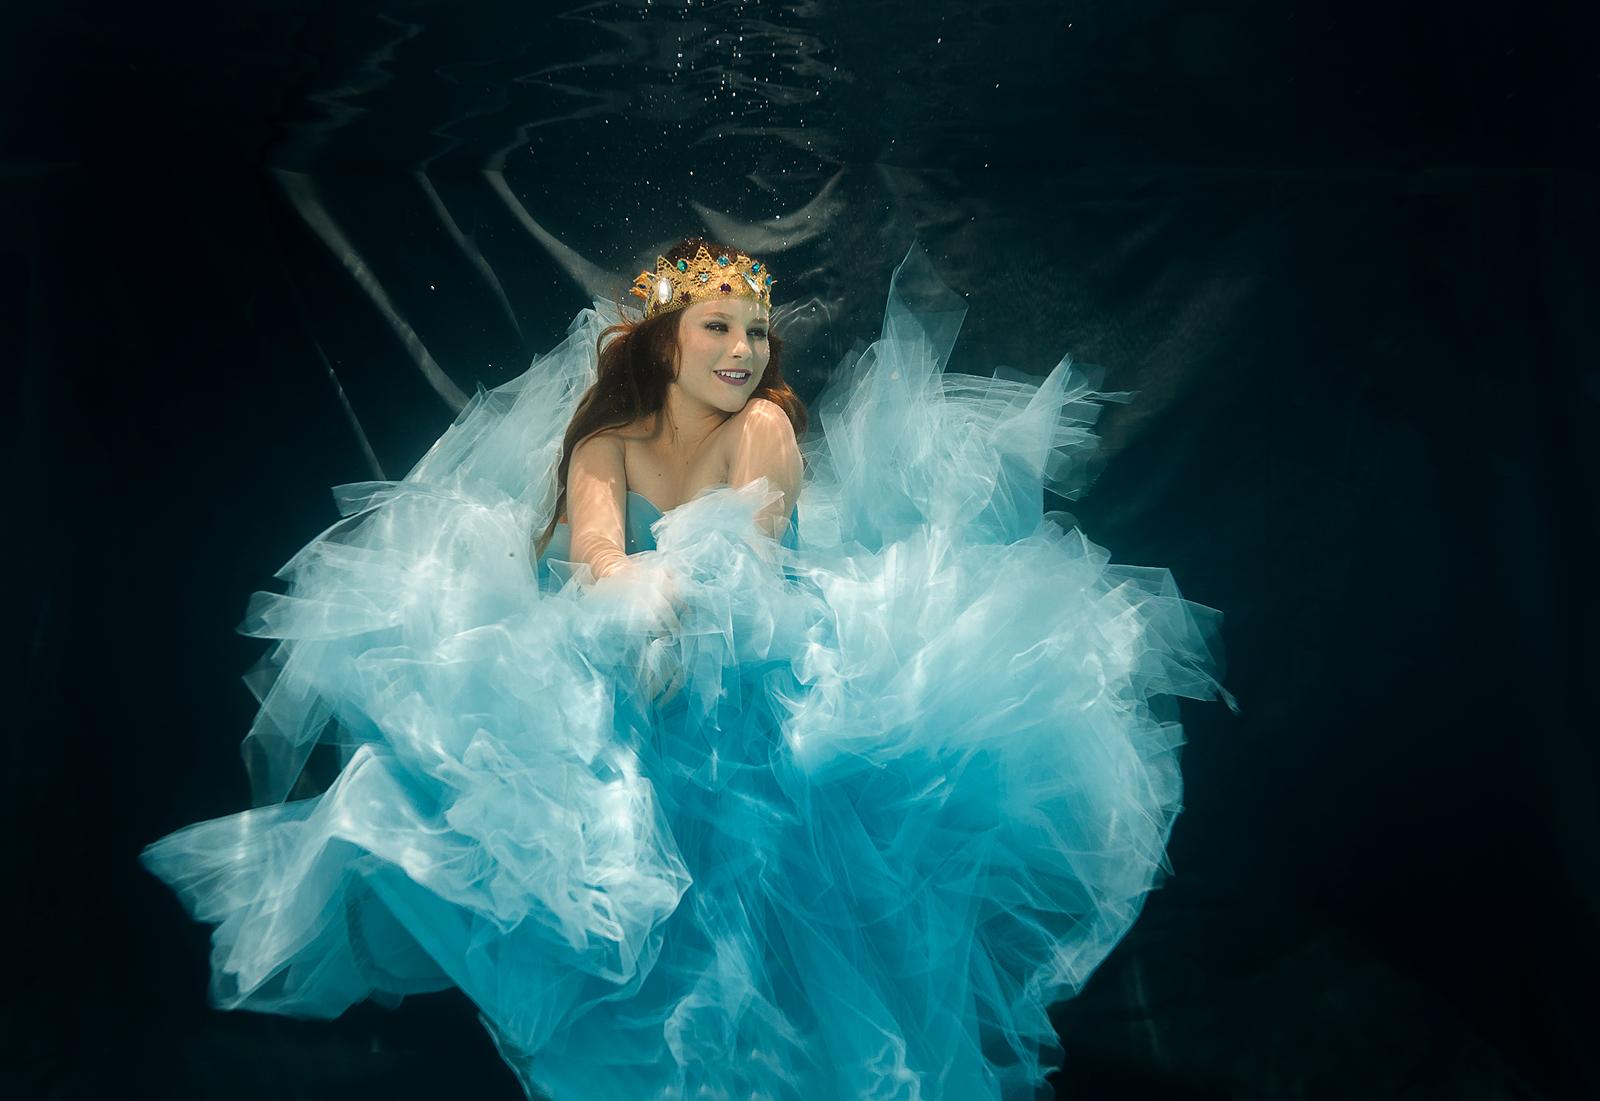 marcosvaldés|FOTÓGRAFO® underwater portrait photographer